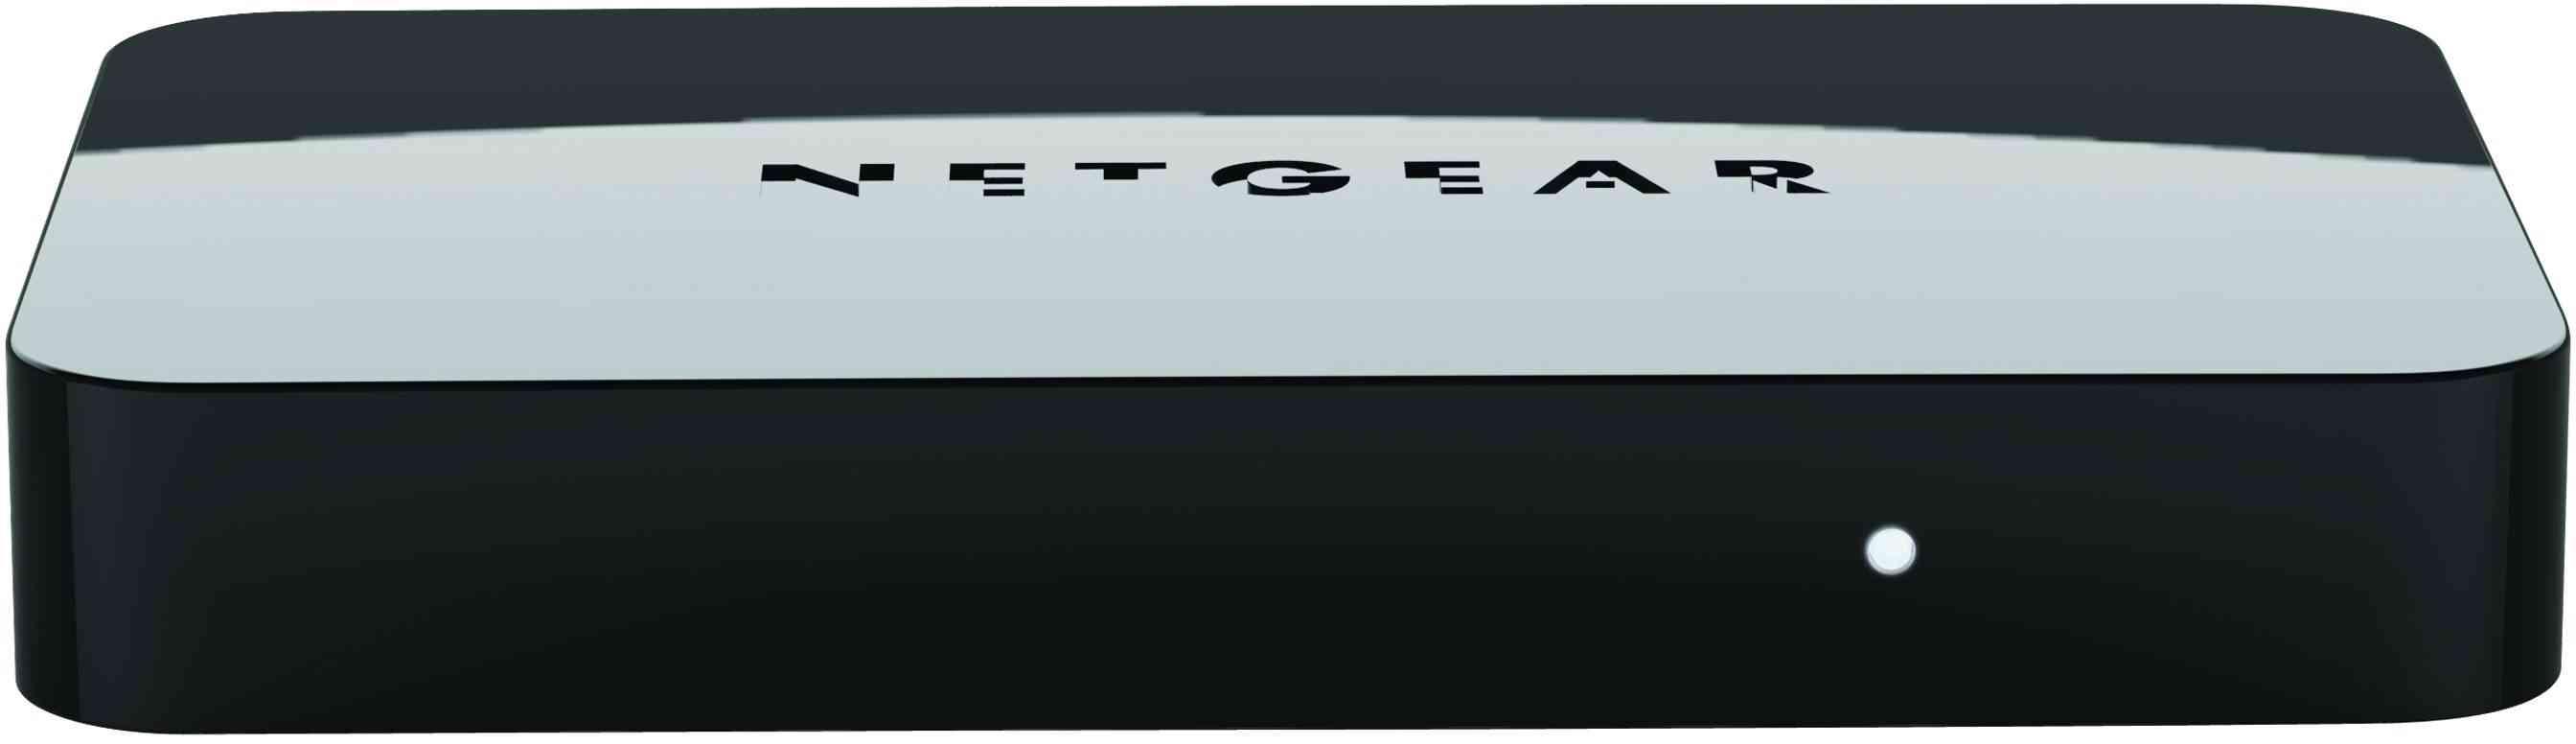 Disco Duro Multimedia Netgear Ptv3000-100pes